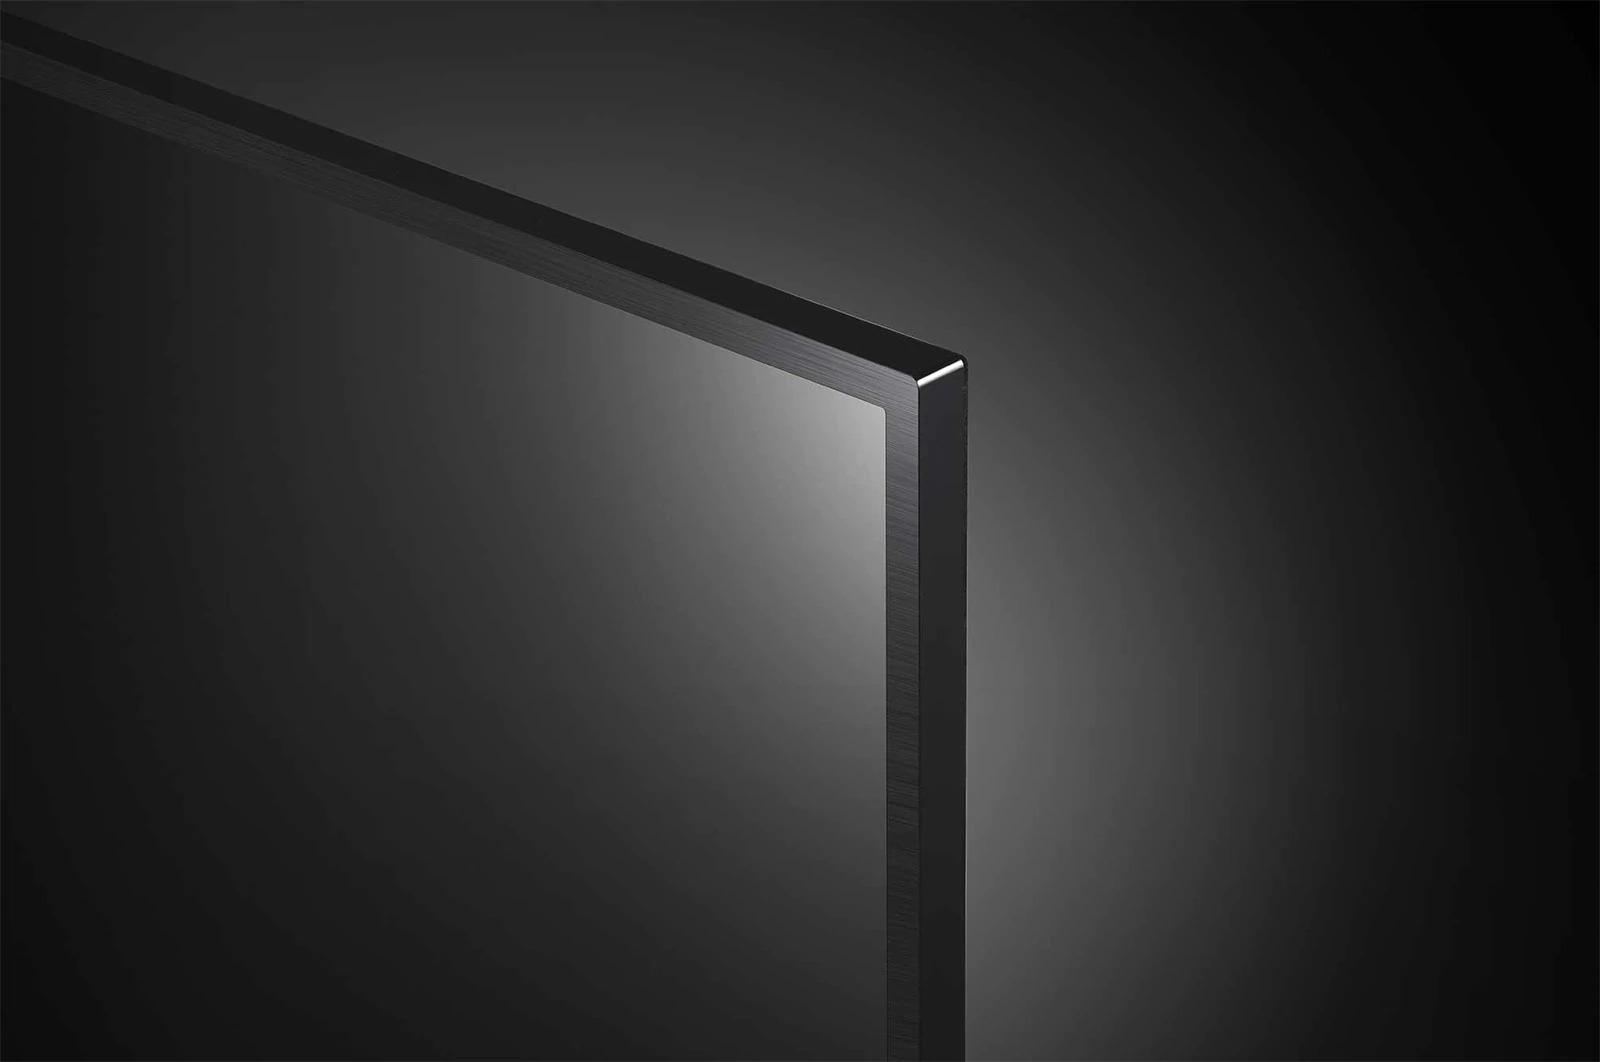 LG (65UN7300PTC) 65 (165.1cm) 4K Smart UHD TV